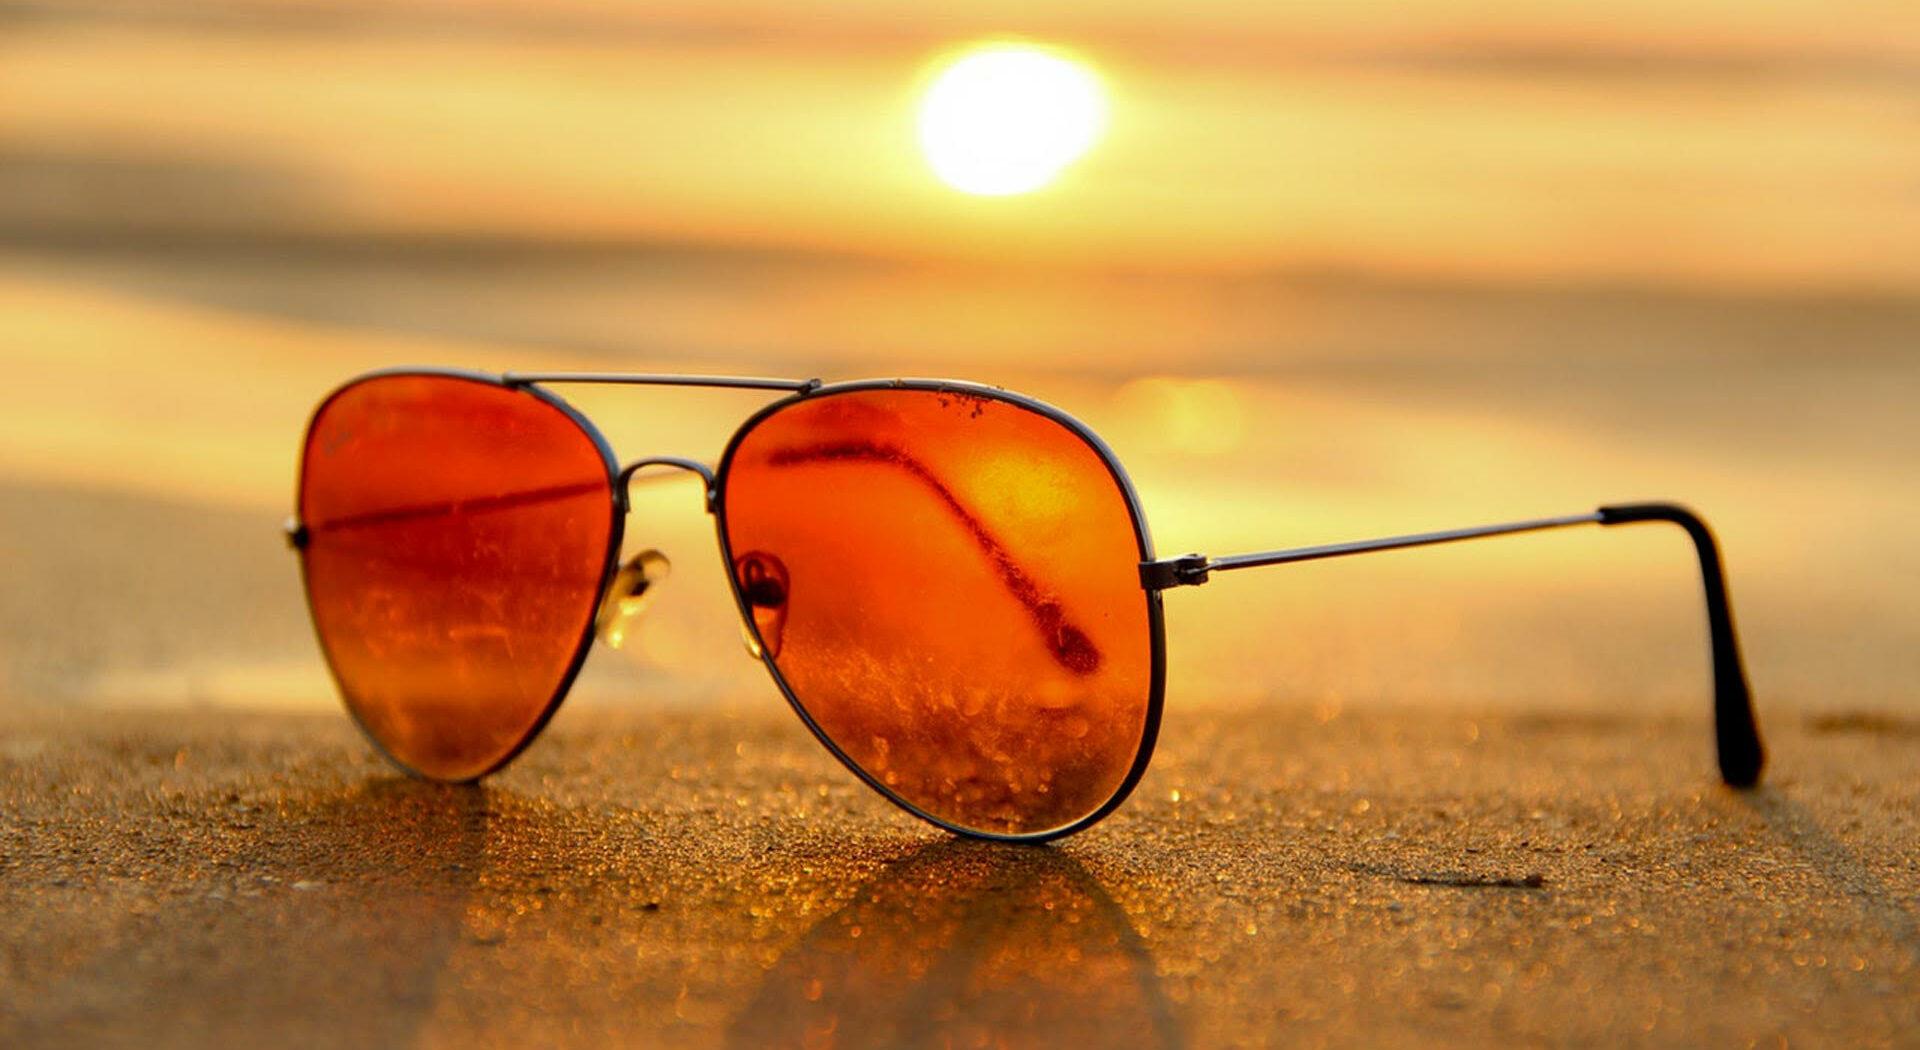 5 Best Sunglasses Brands in 2019